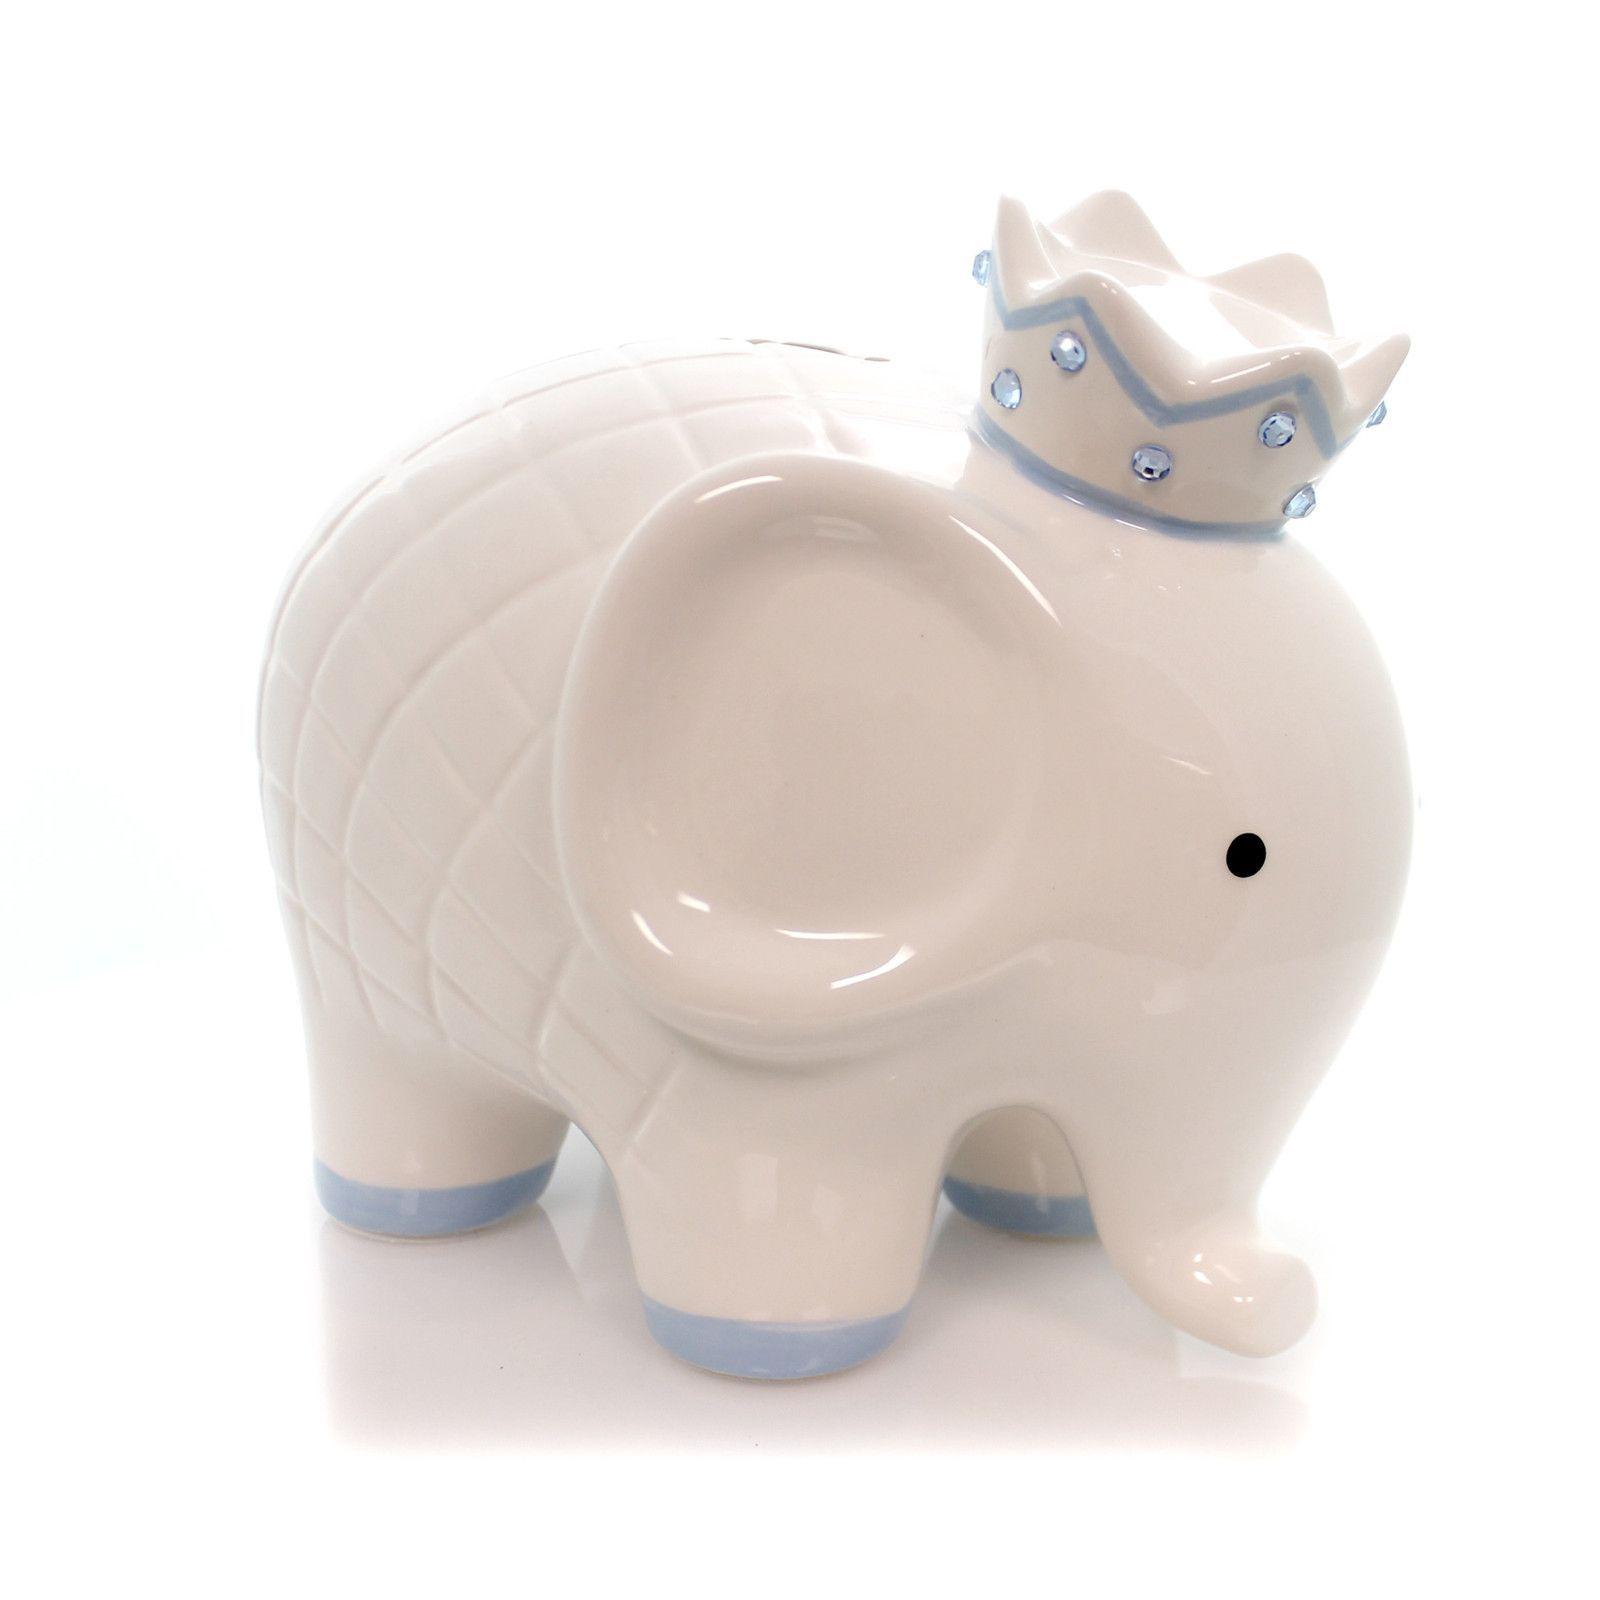 White/Blue Coco Elephant Bank Bank